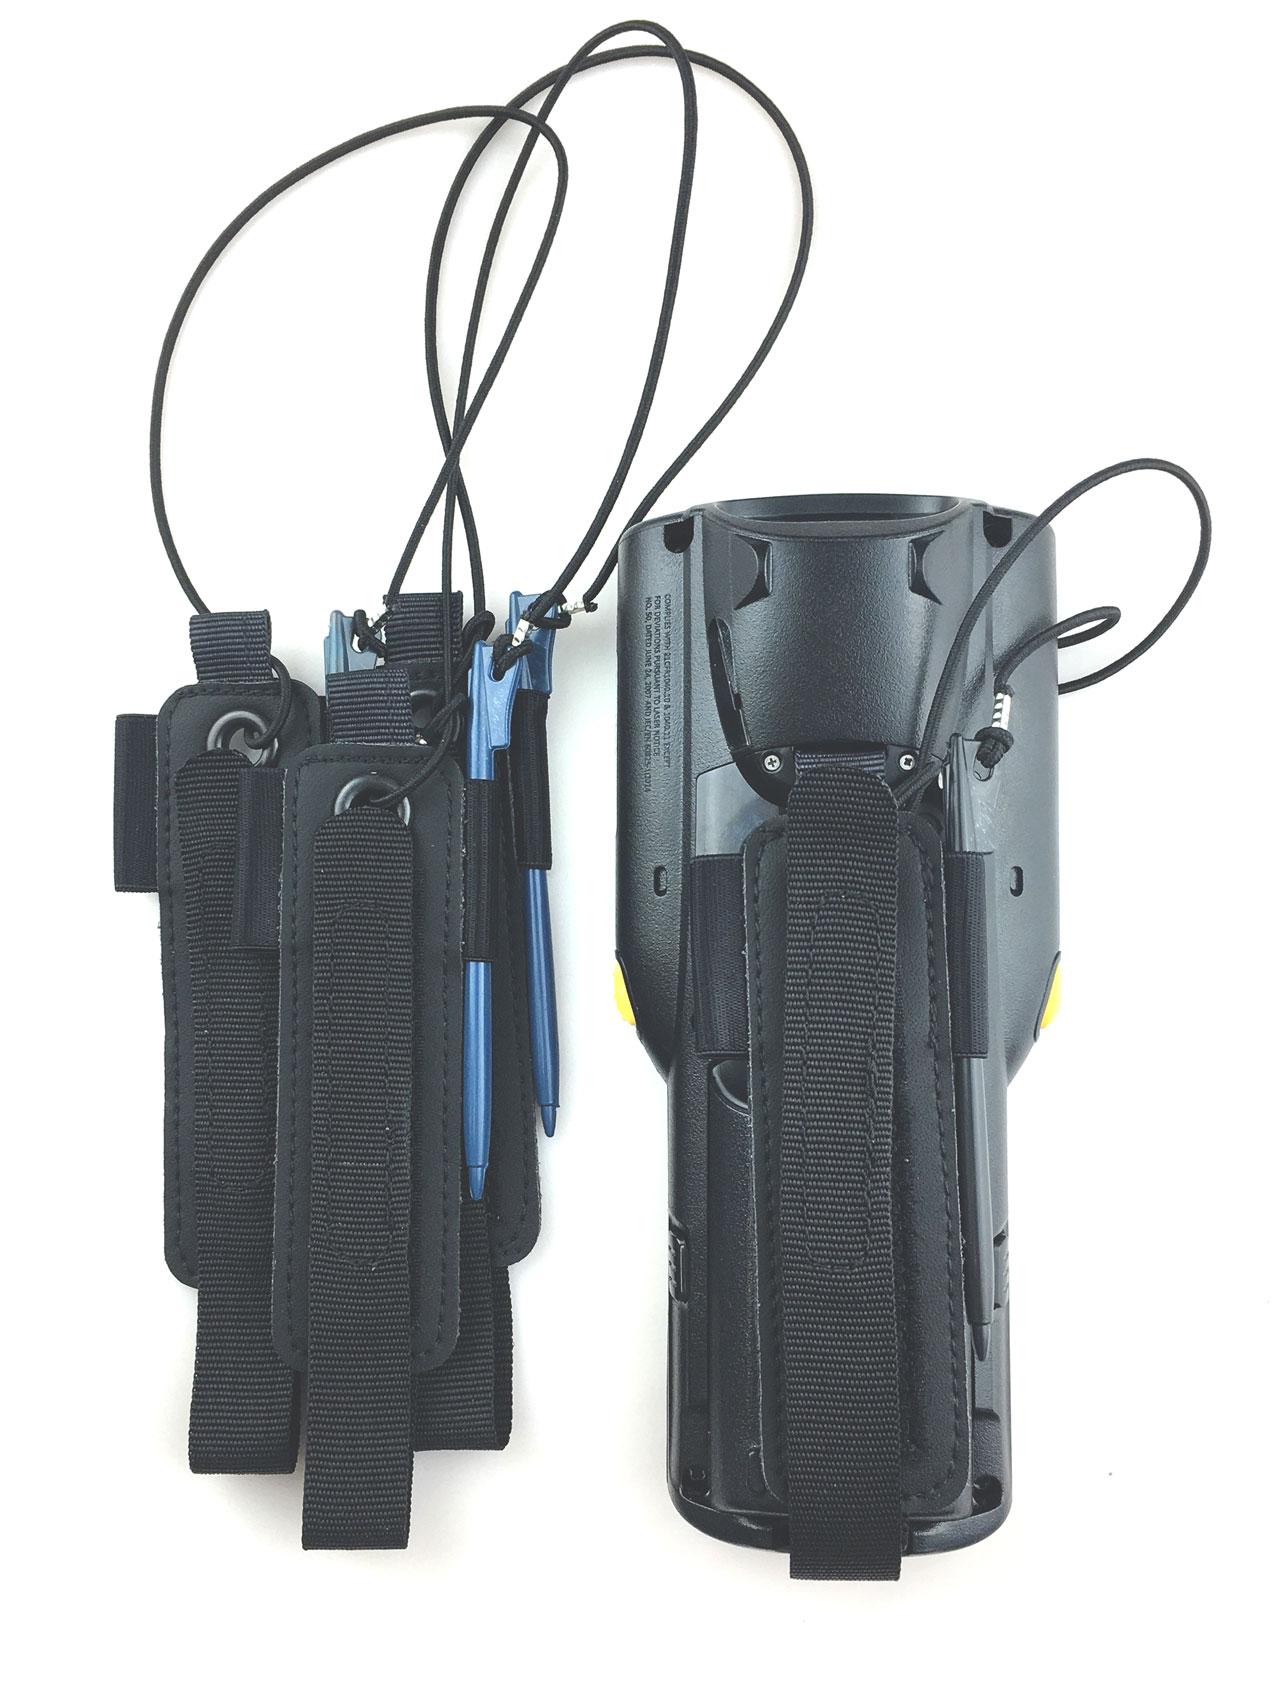 mc3190-mc32n0-hand-strap-tsd-remen